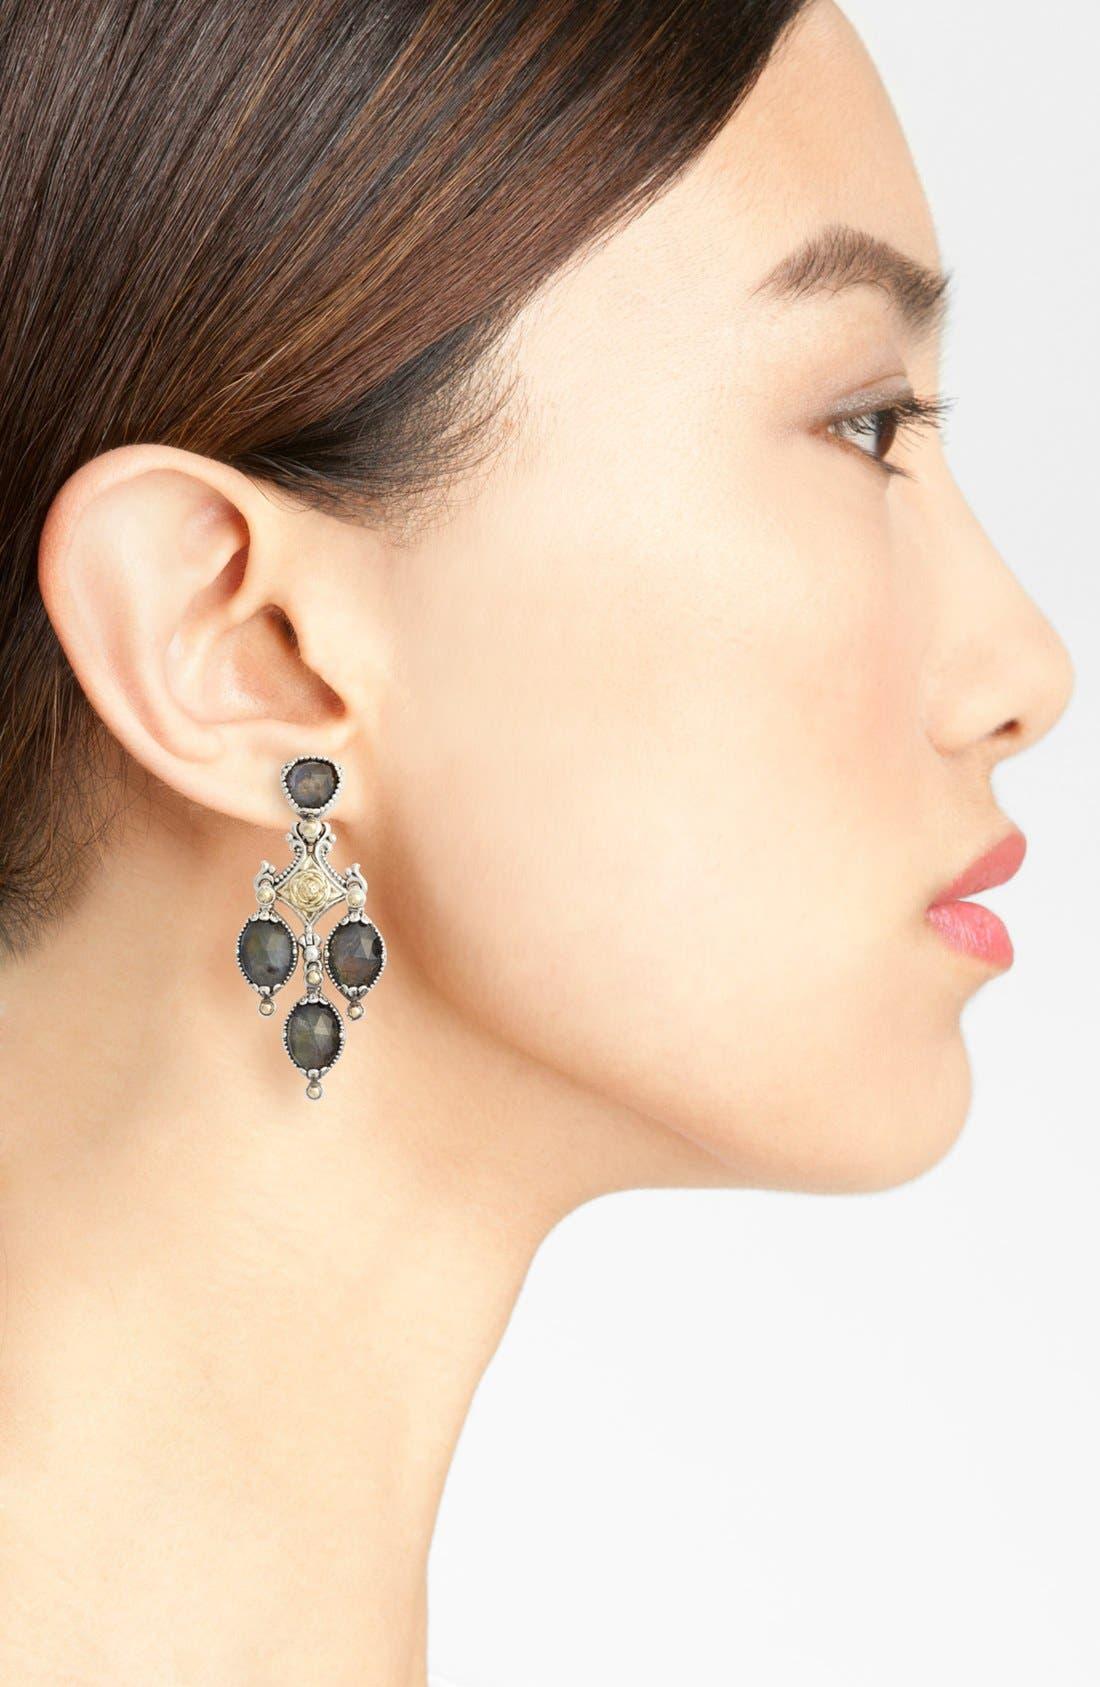 Cassiopeia Triple Drop Chandelier Earrings,                             Alternate thumbnail 2, color,                             LABRADORITE